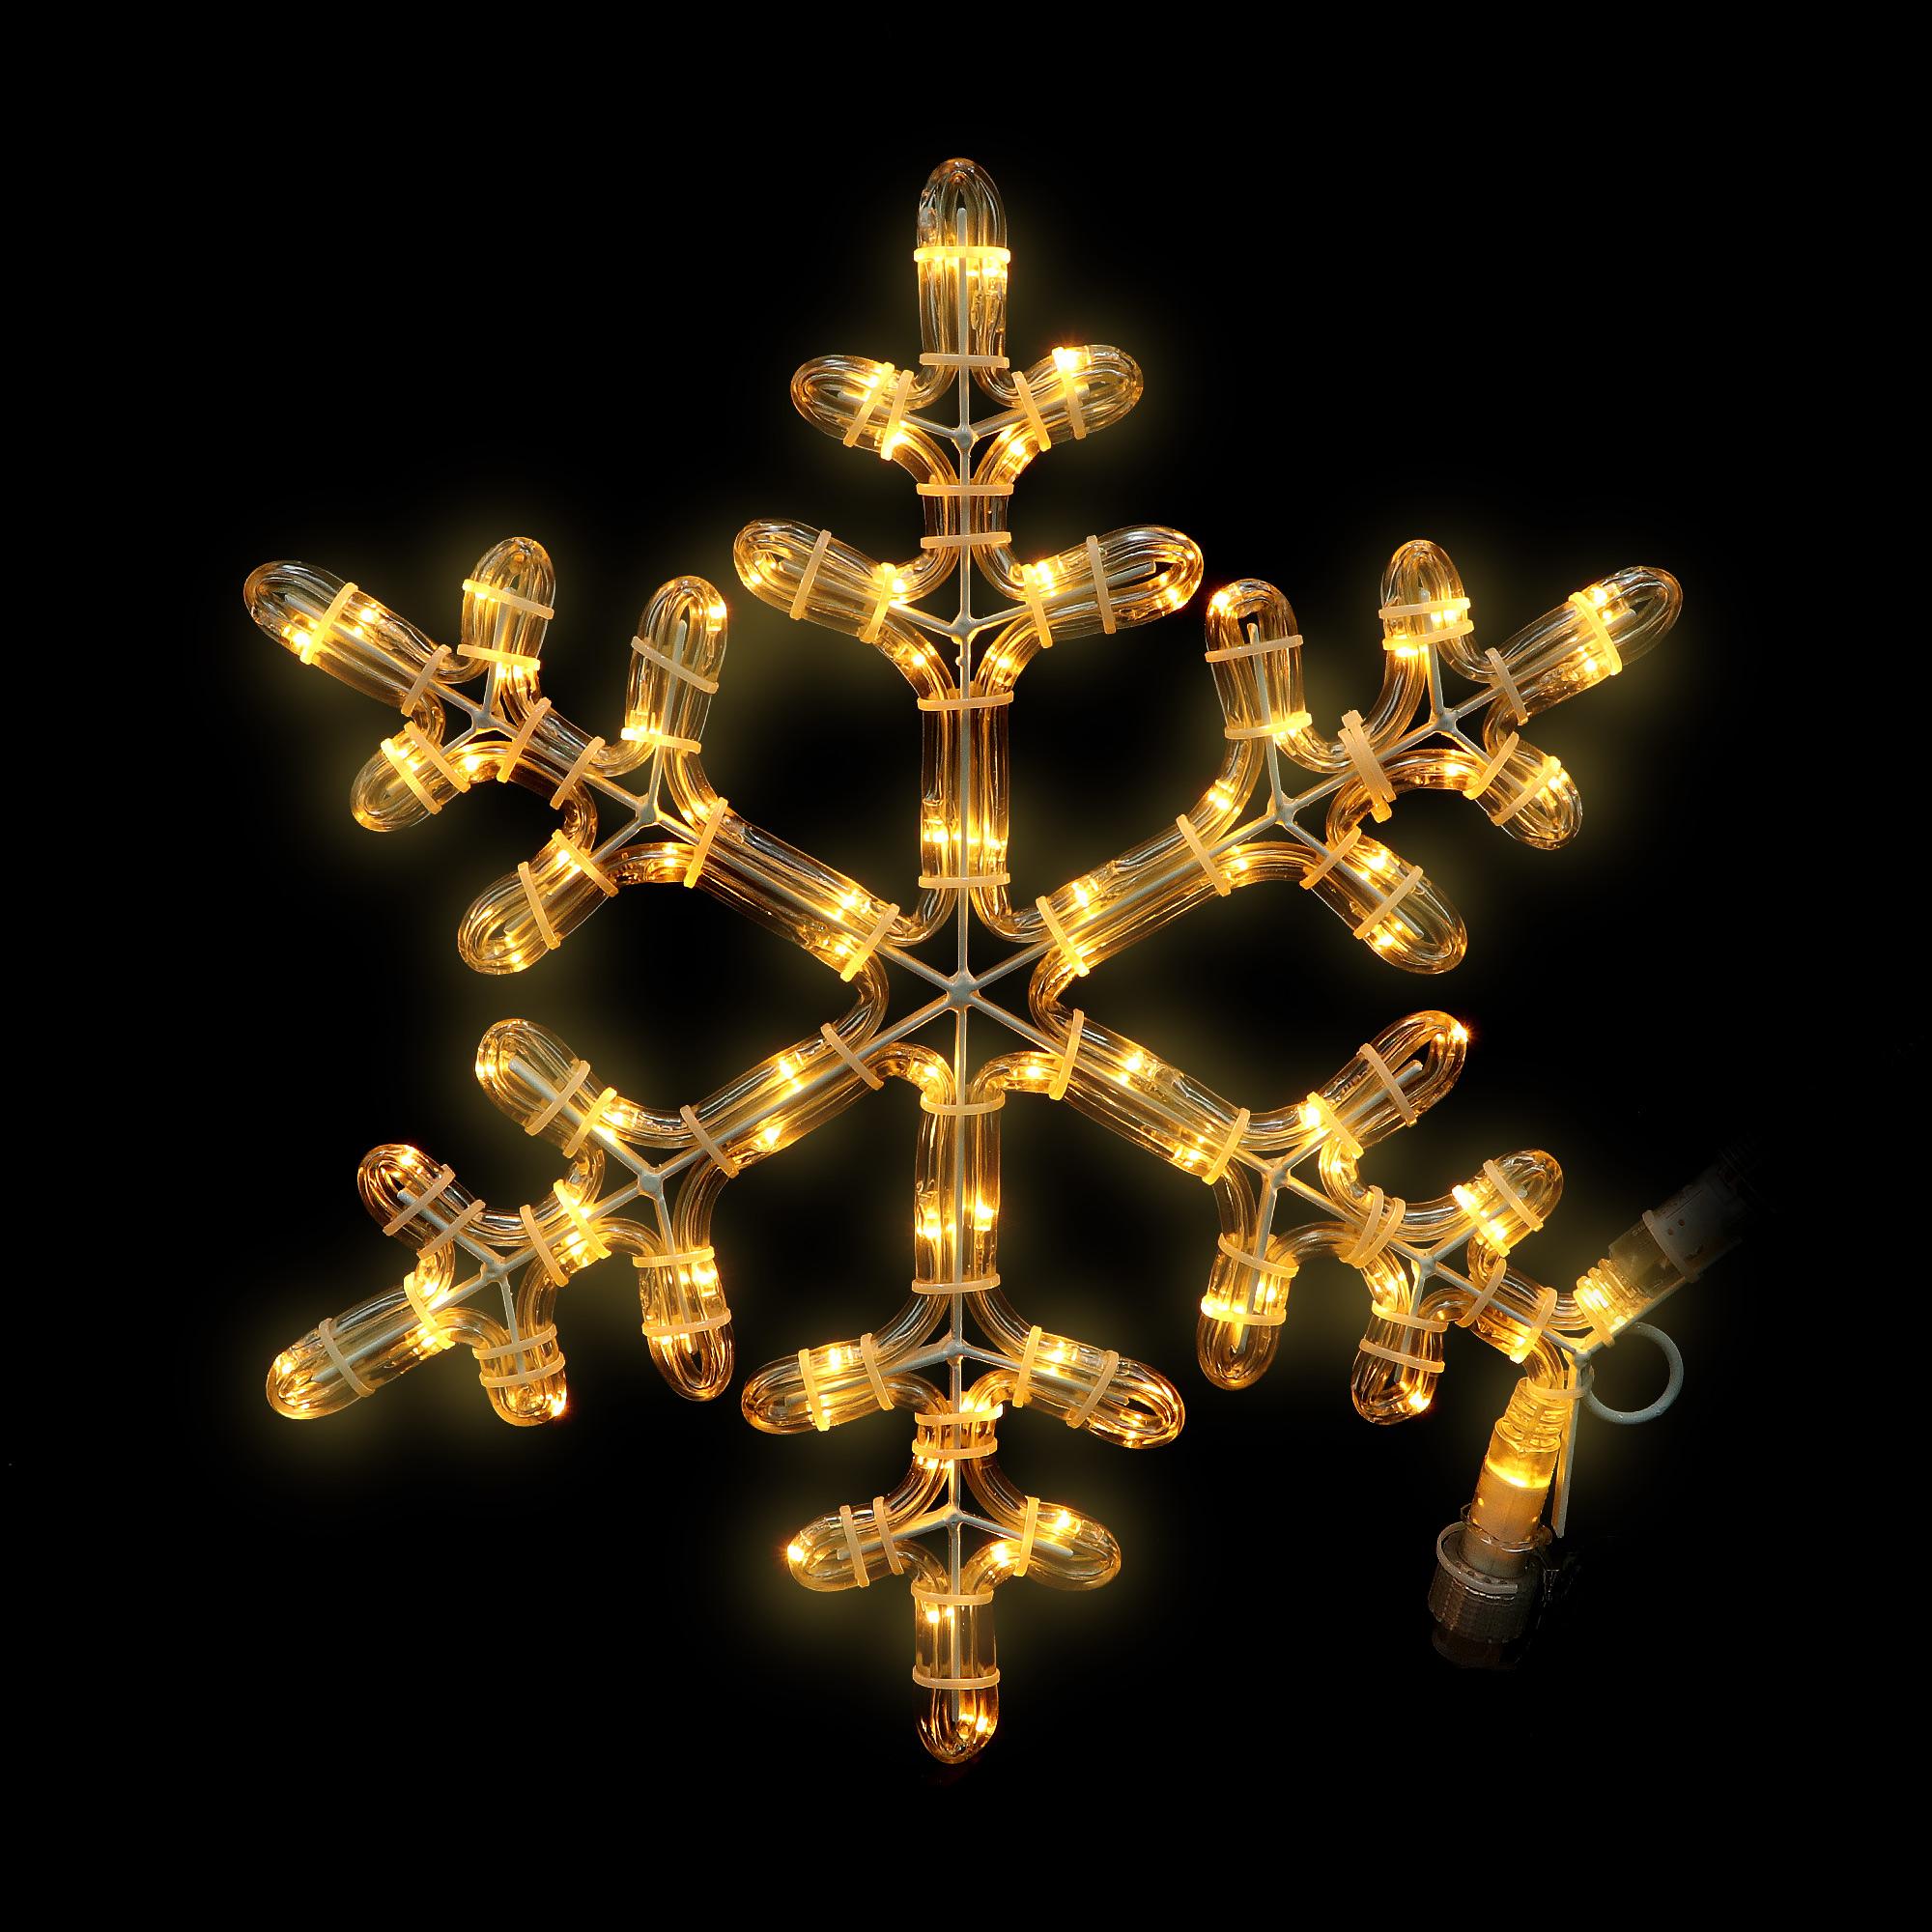 Украшение уличное System expo/star trading snowflake 40см